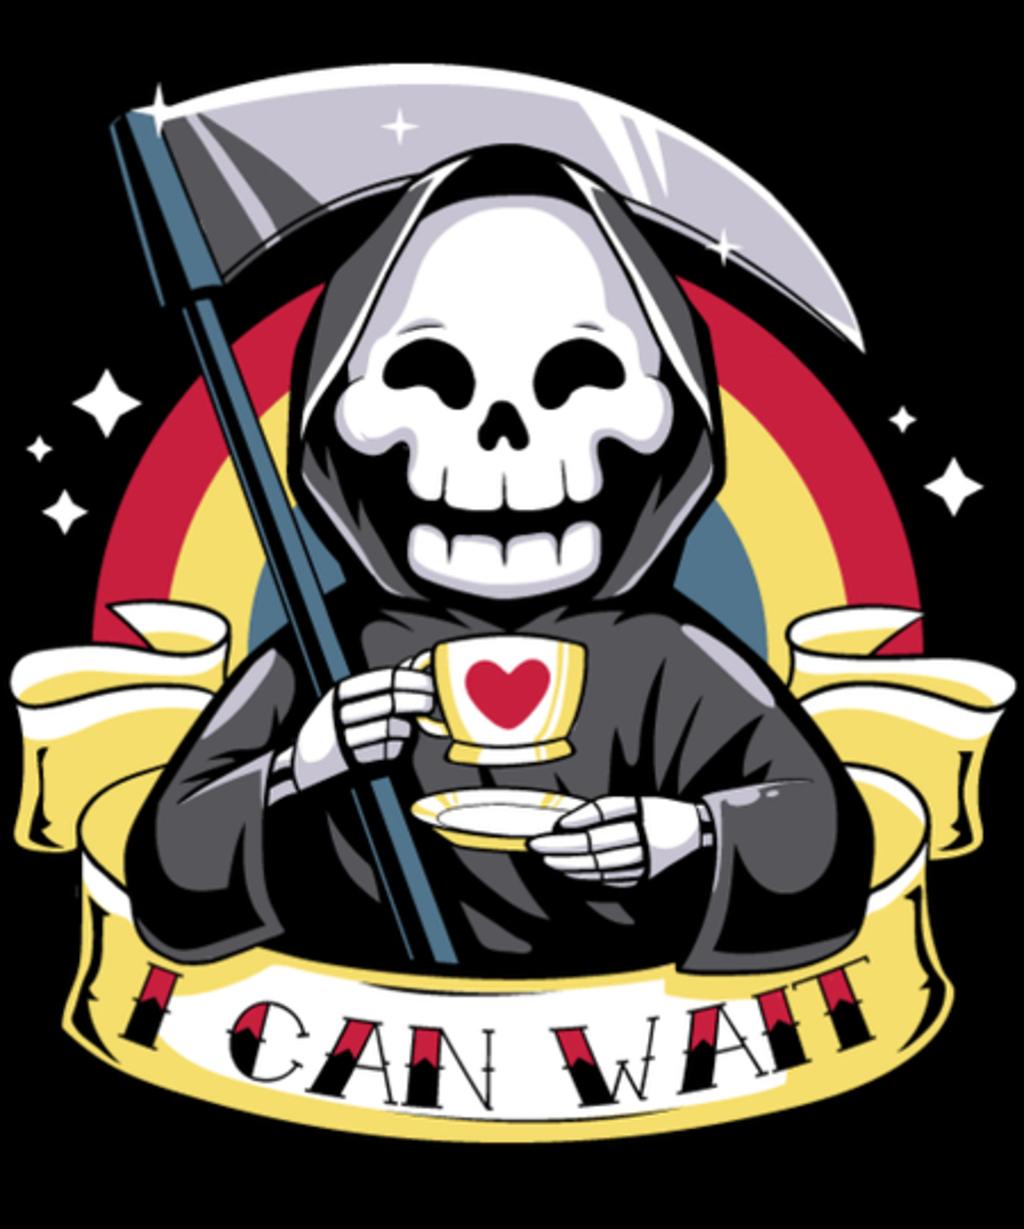 Qwertee: I can wait